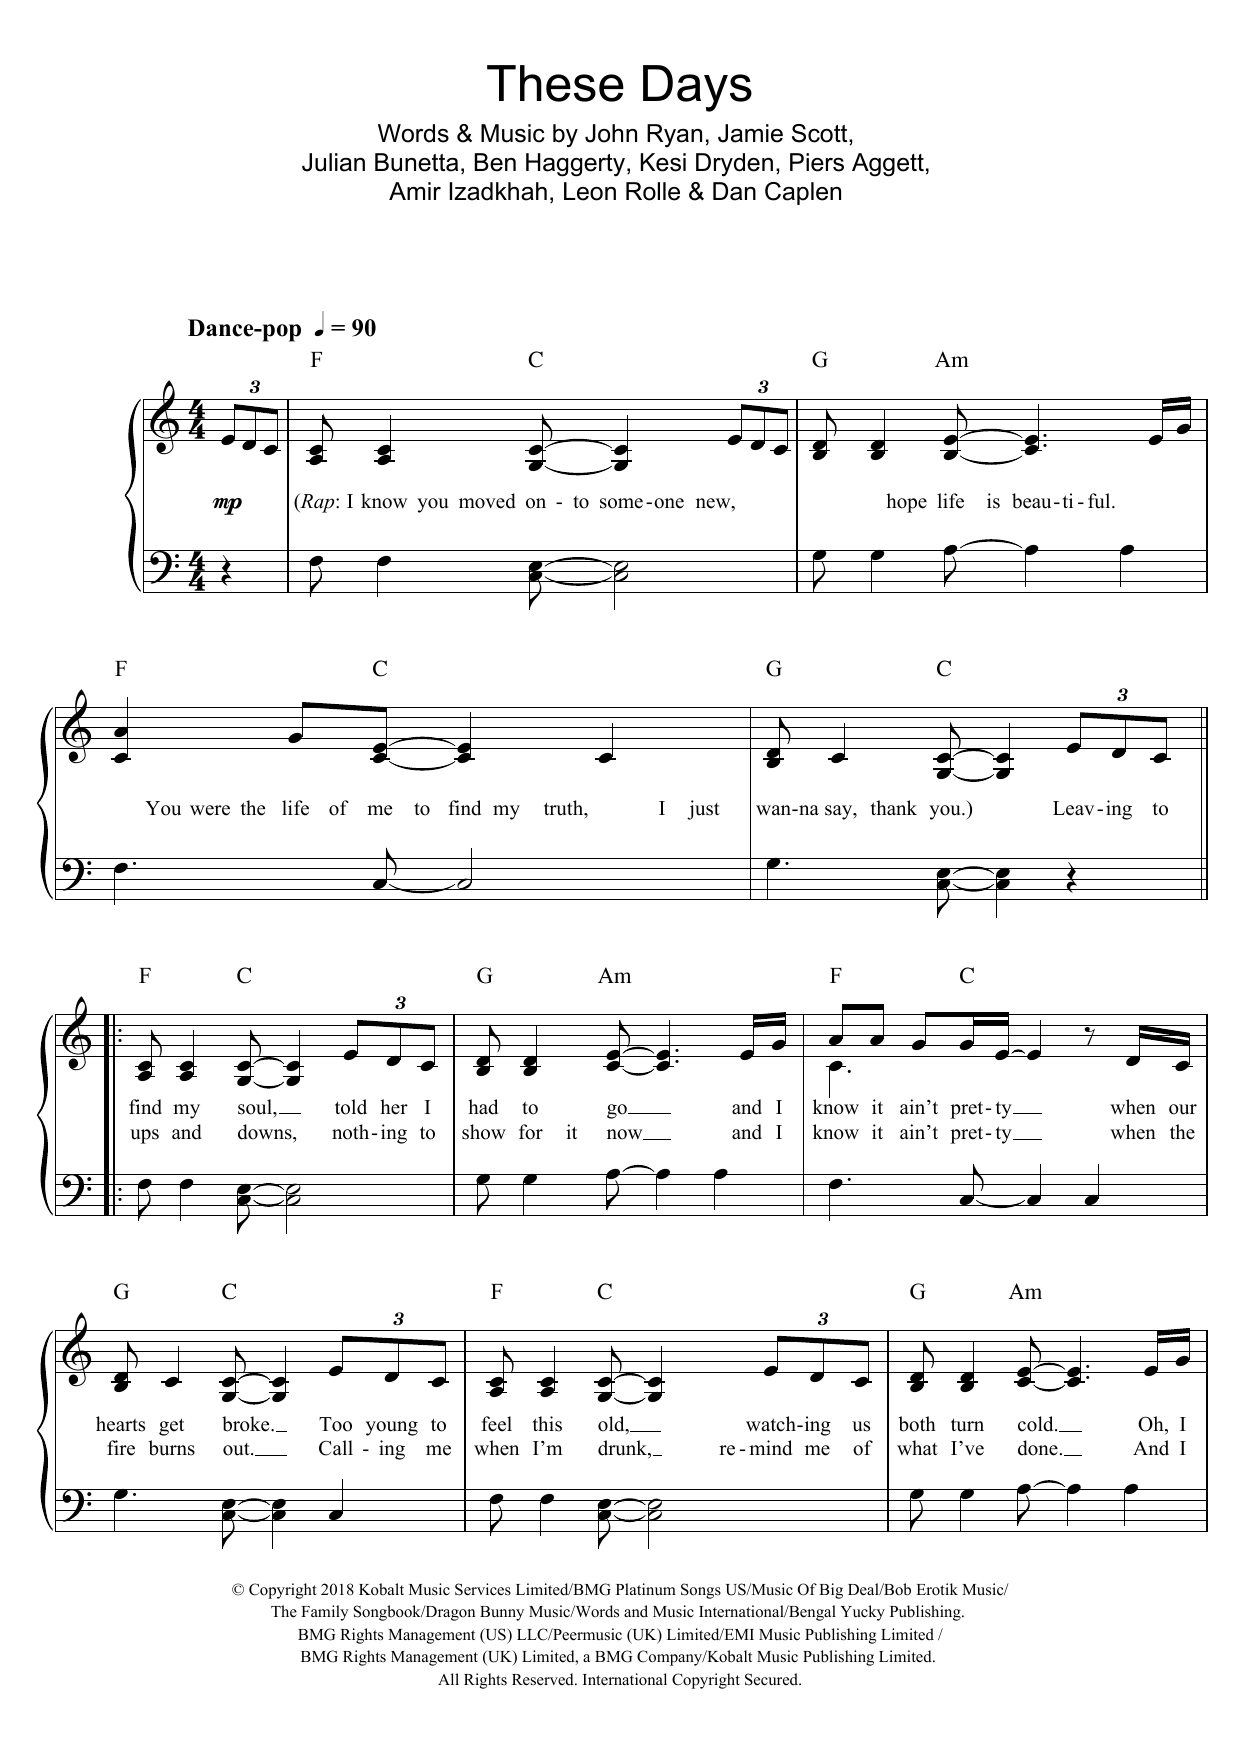 These Days (featuring Jess Glynne, Macklemore and Dan Caplen) Sheet Music